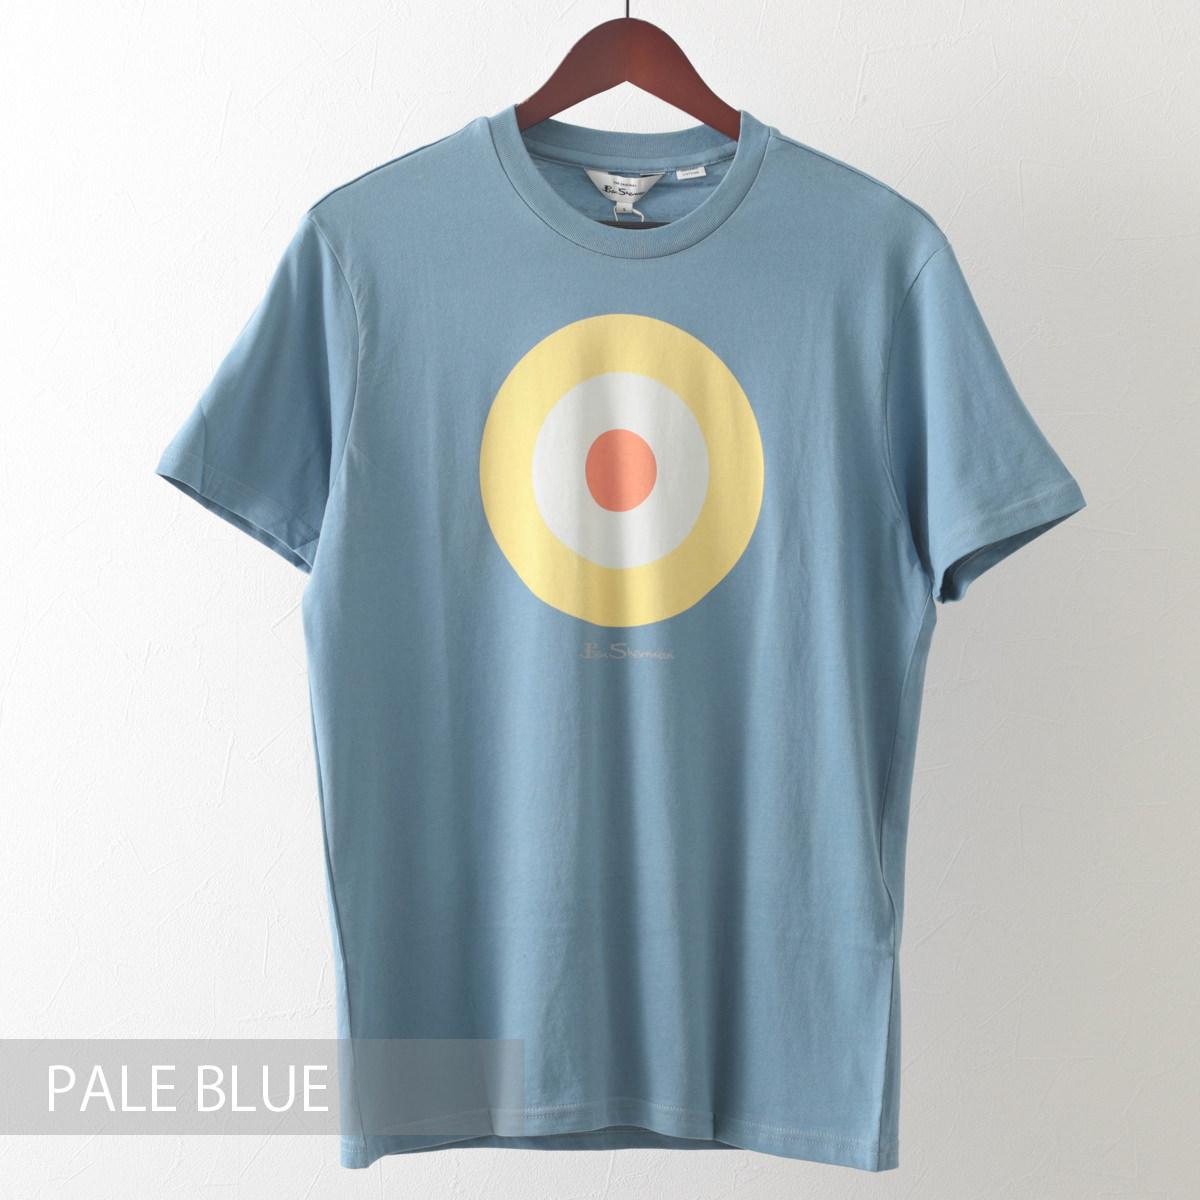 Ben Sherman ベンシャーマン メンズ Tシャツ ターゲットマークプリント 6色 オレンジ ダークネイビー グリーン ペールブルー ホワイト ワイン オーガニックコットン レギュラーフィット